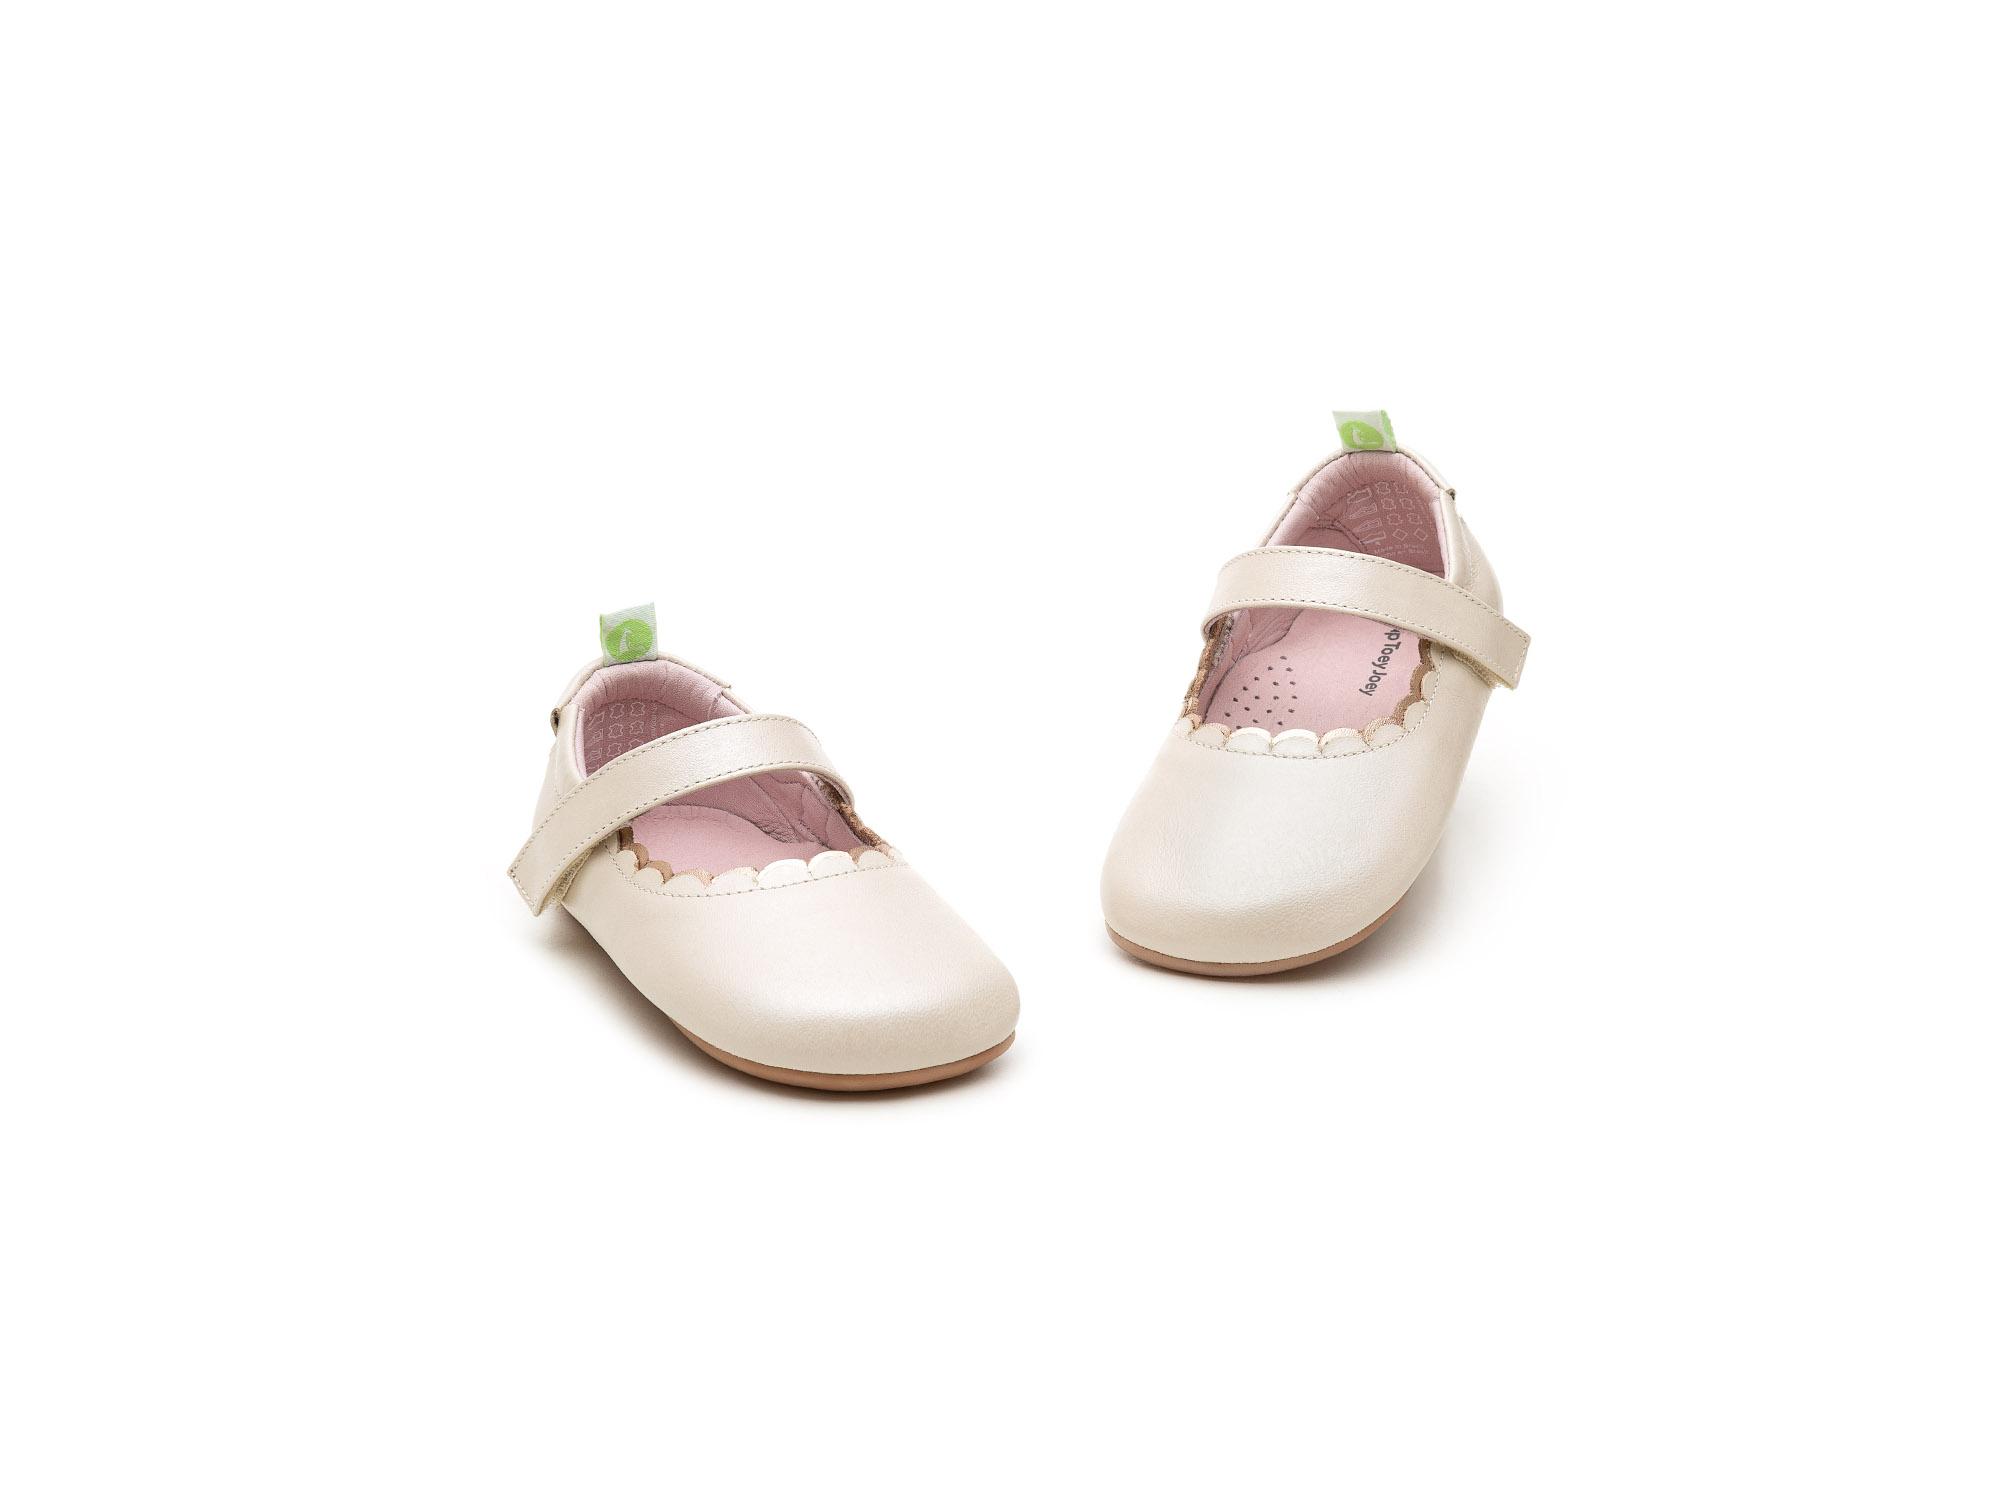 sapatilha Bebê feminino roundy